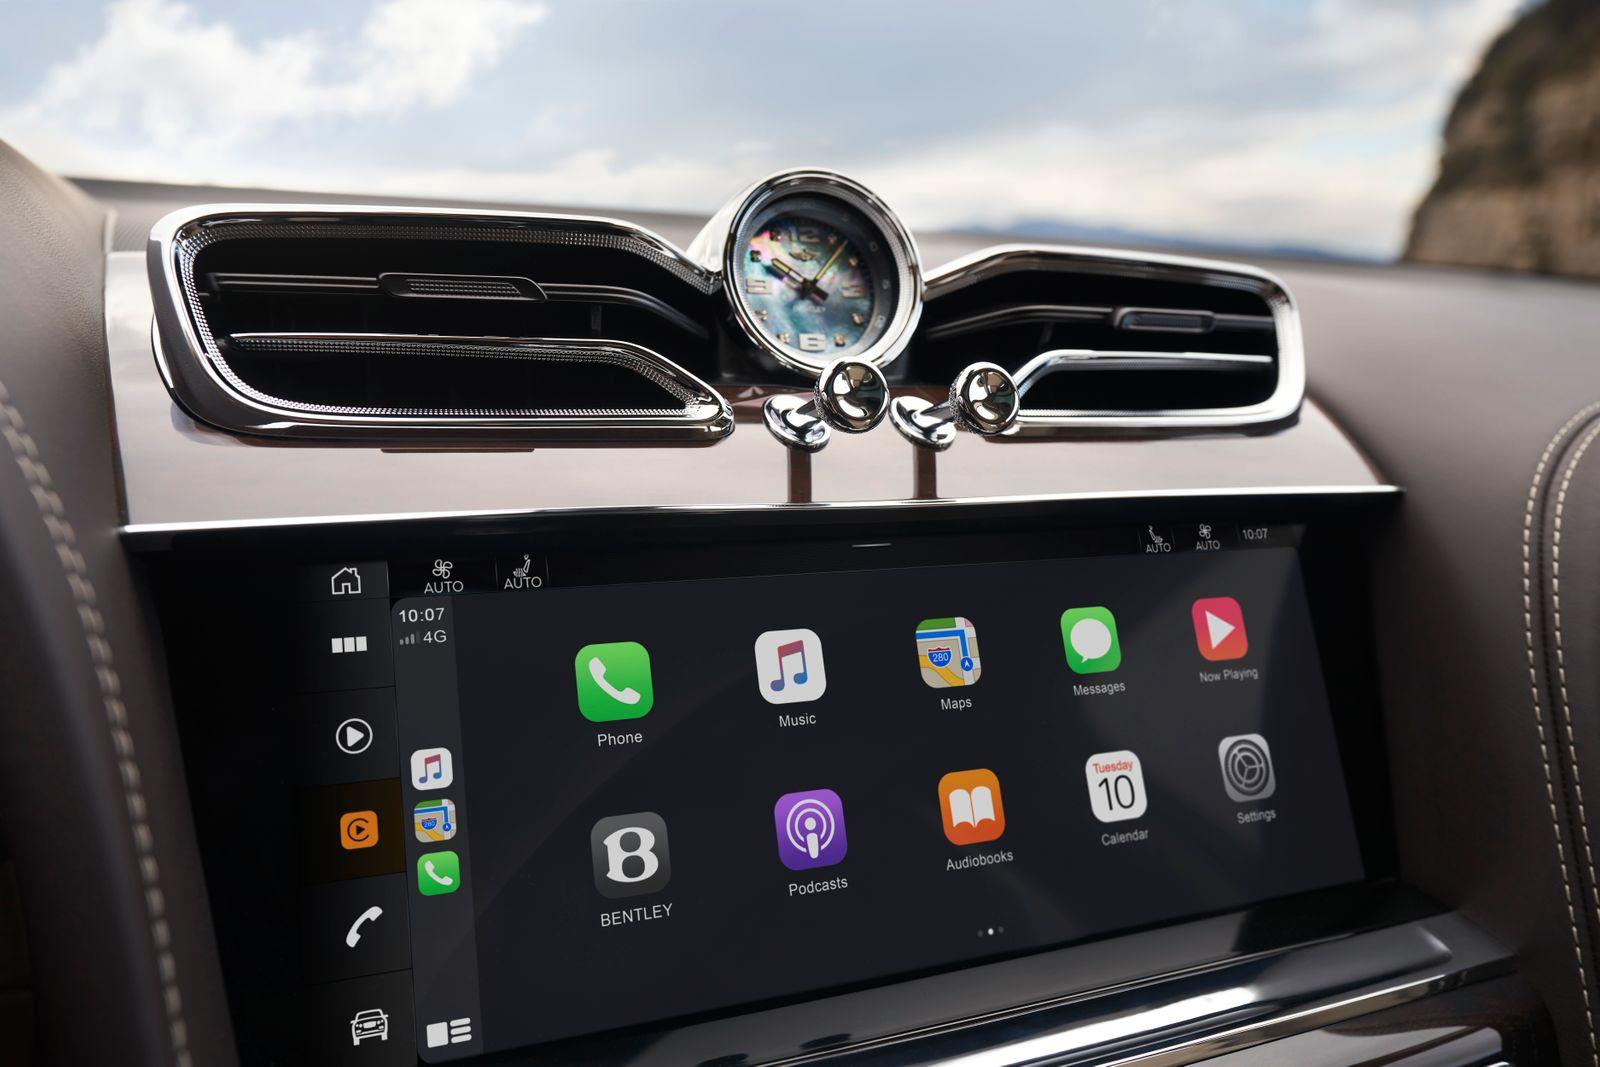 Bentley Bentayga / Touchscreen